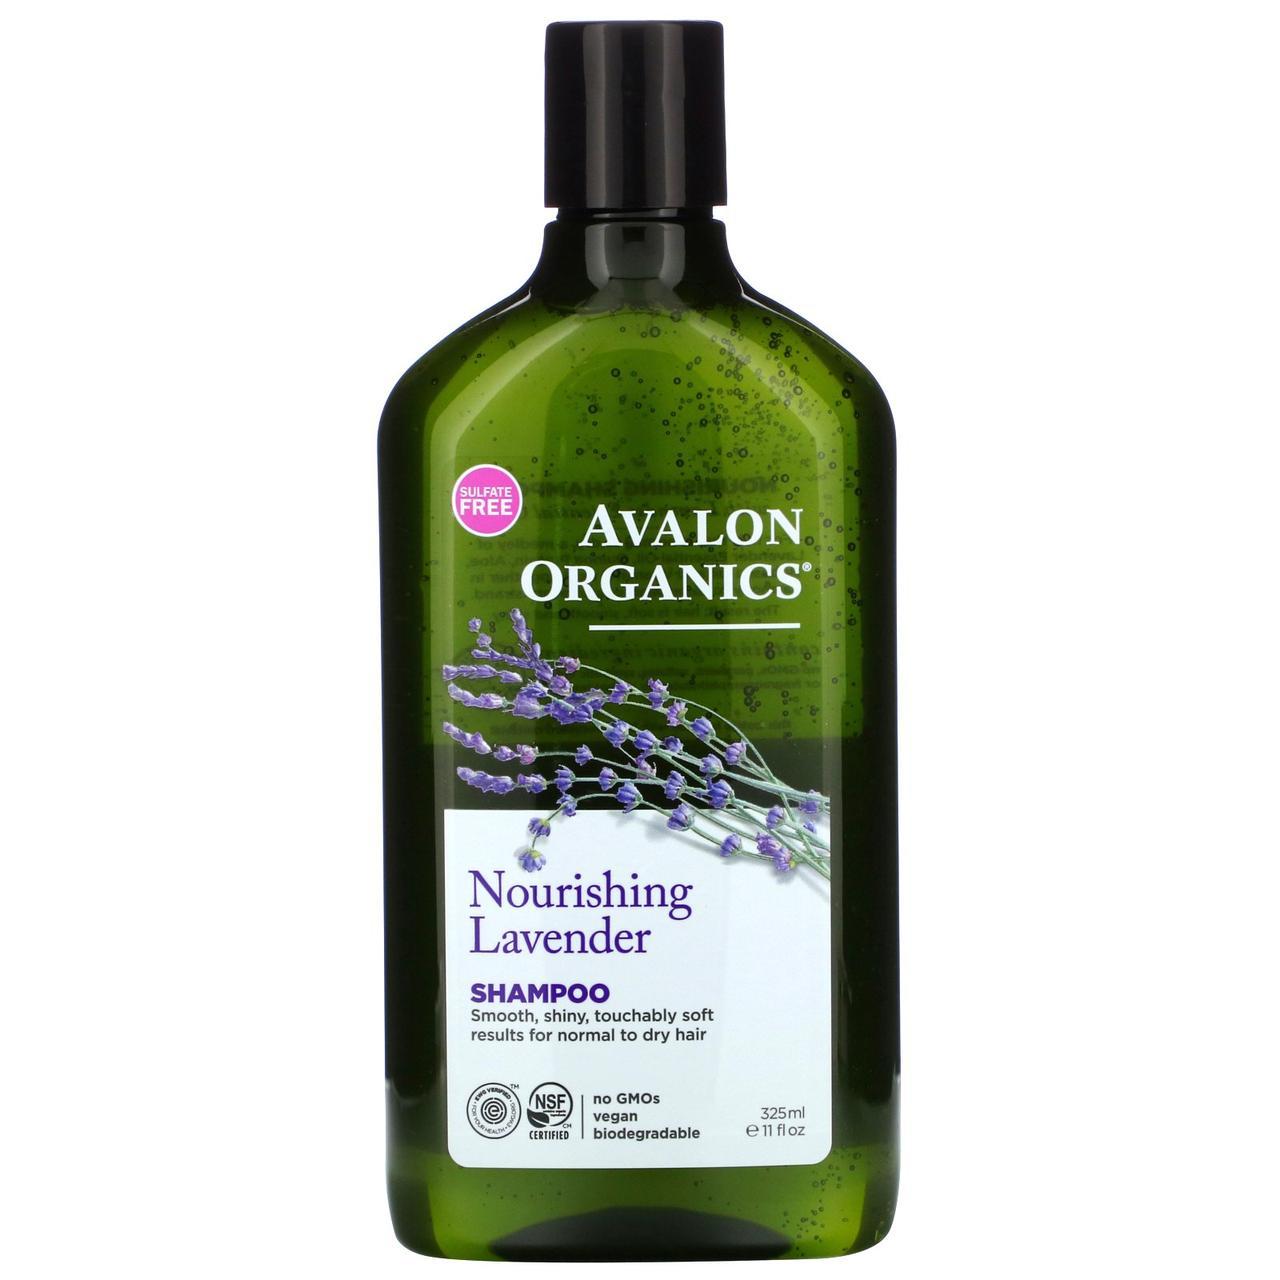 Шампунь для волос (лаванда), Avalon Organics, 325 мл